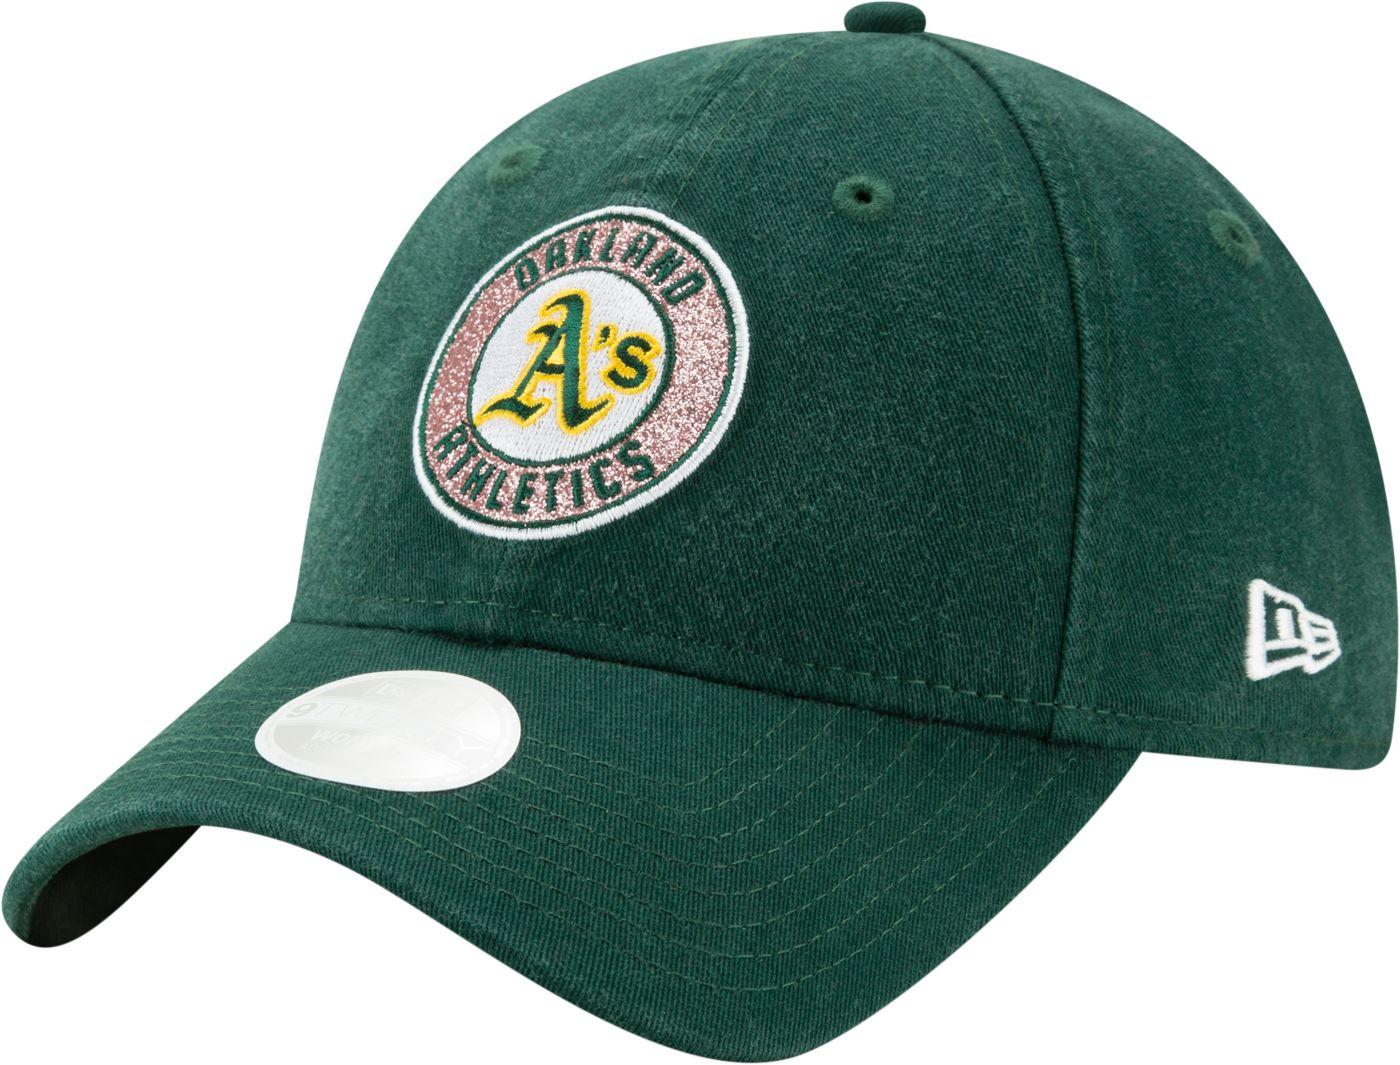 New Era Women's Oakland Athletics 9Twenty Patched Sparkle Adjustable Hat